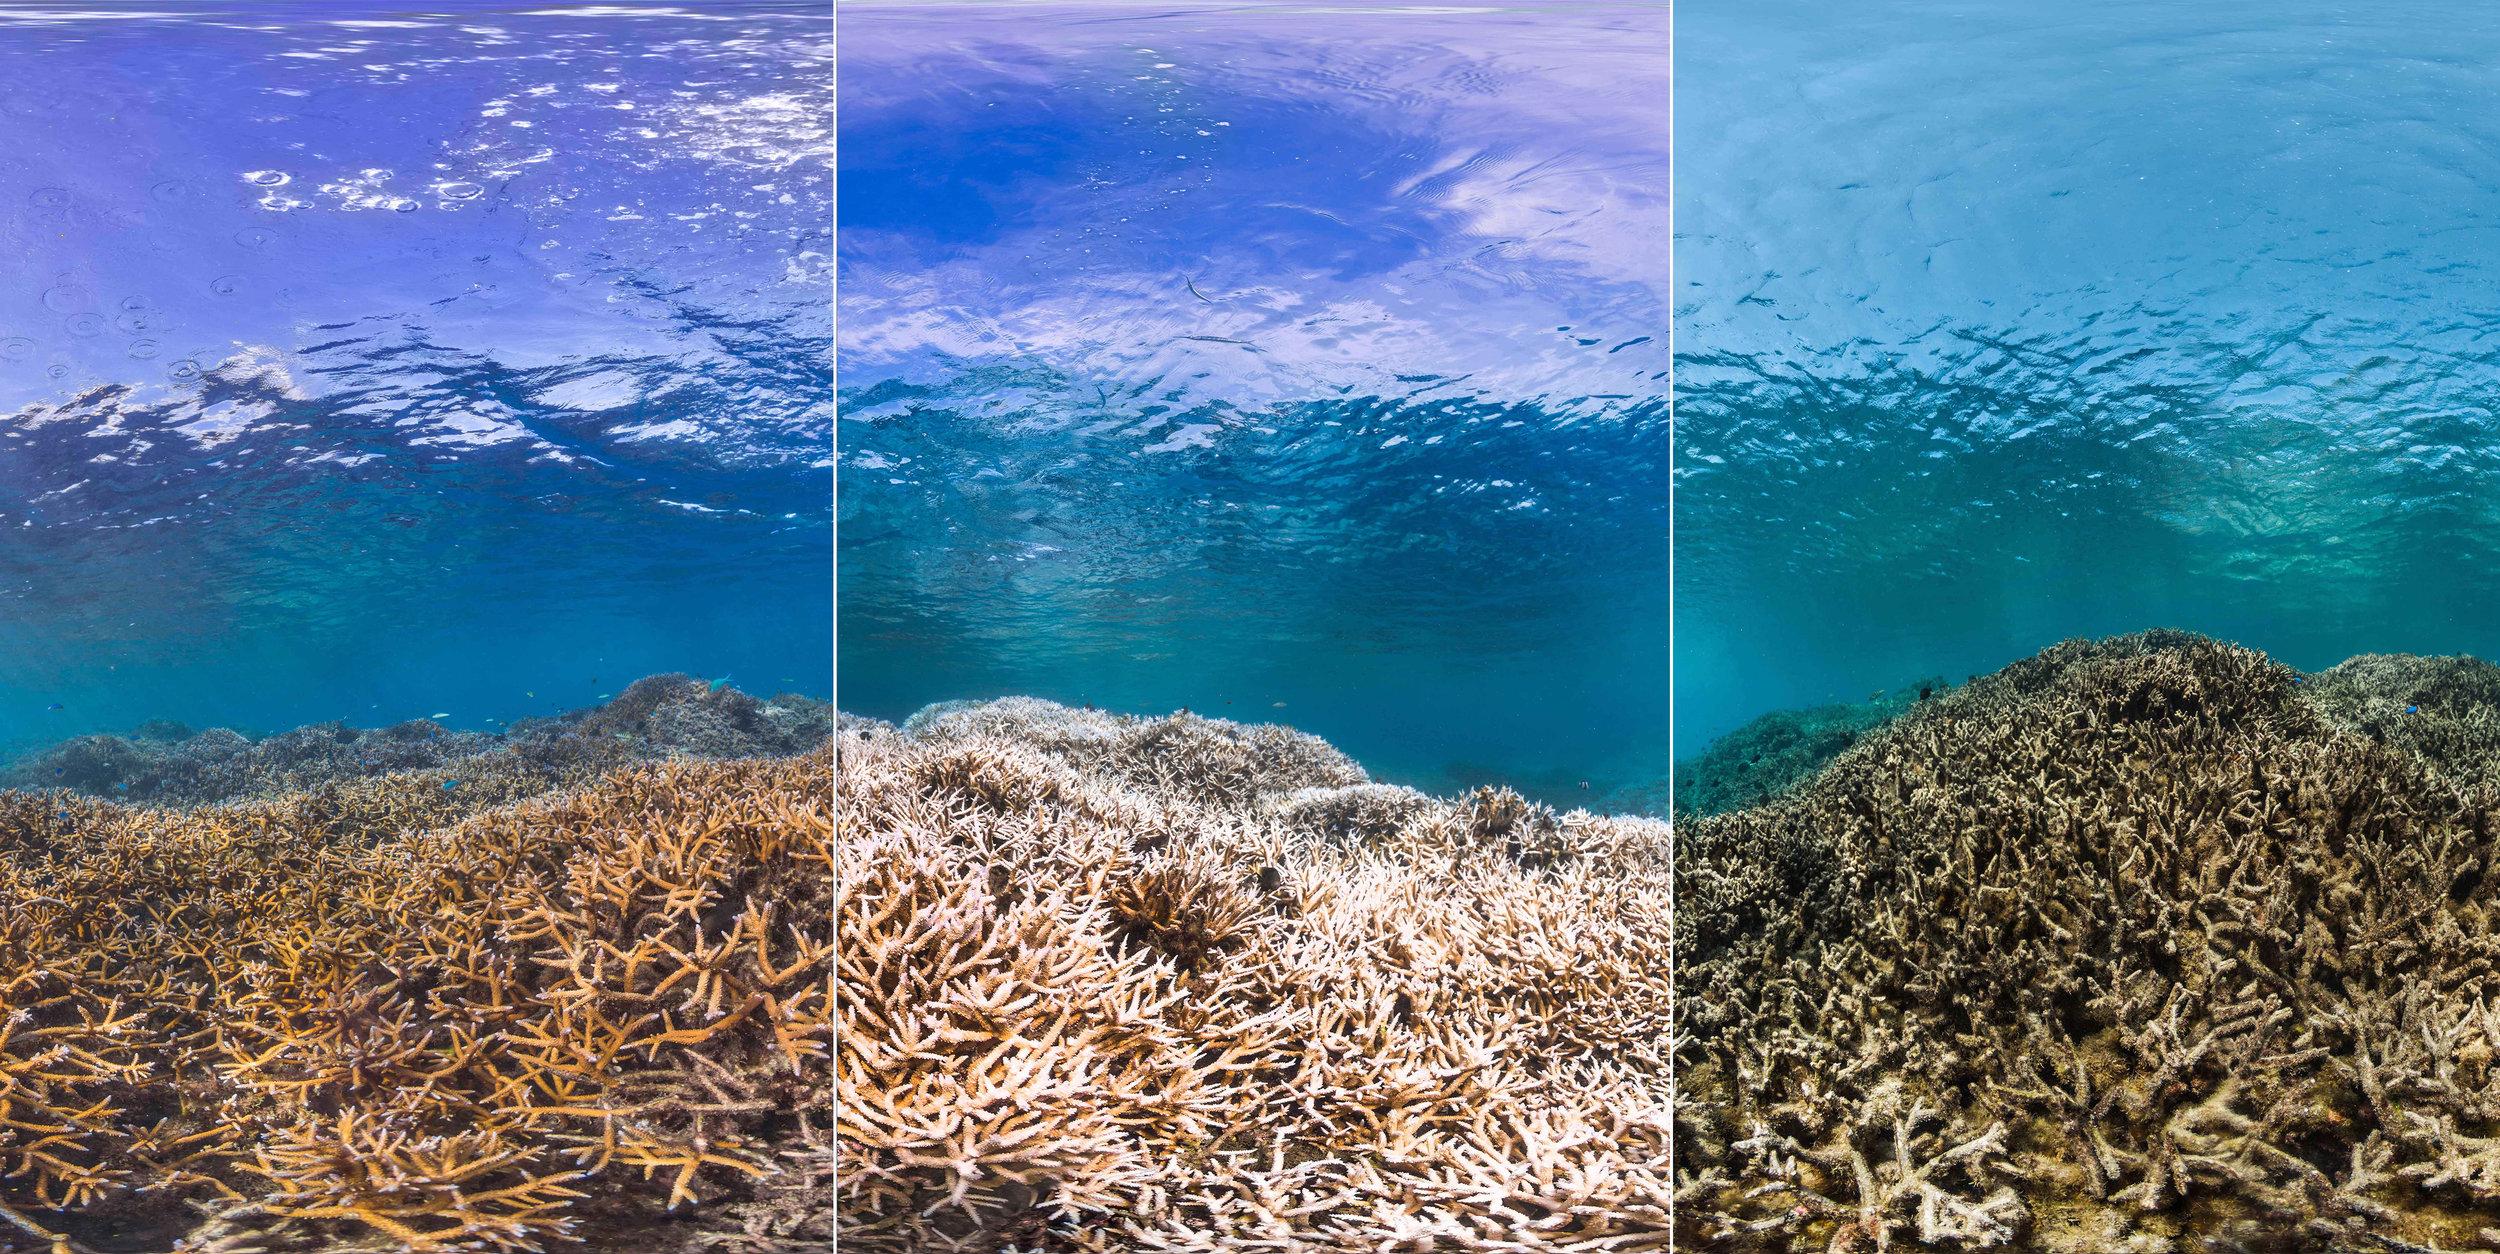 american samoa (dec2014 / feb2015 / aug2015) credit: THE OCEAN AGENCY / XL CATLIN SEAVIEW SURVEY